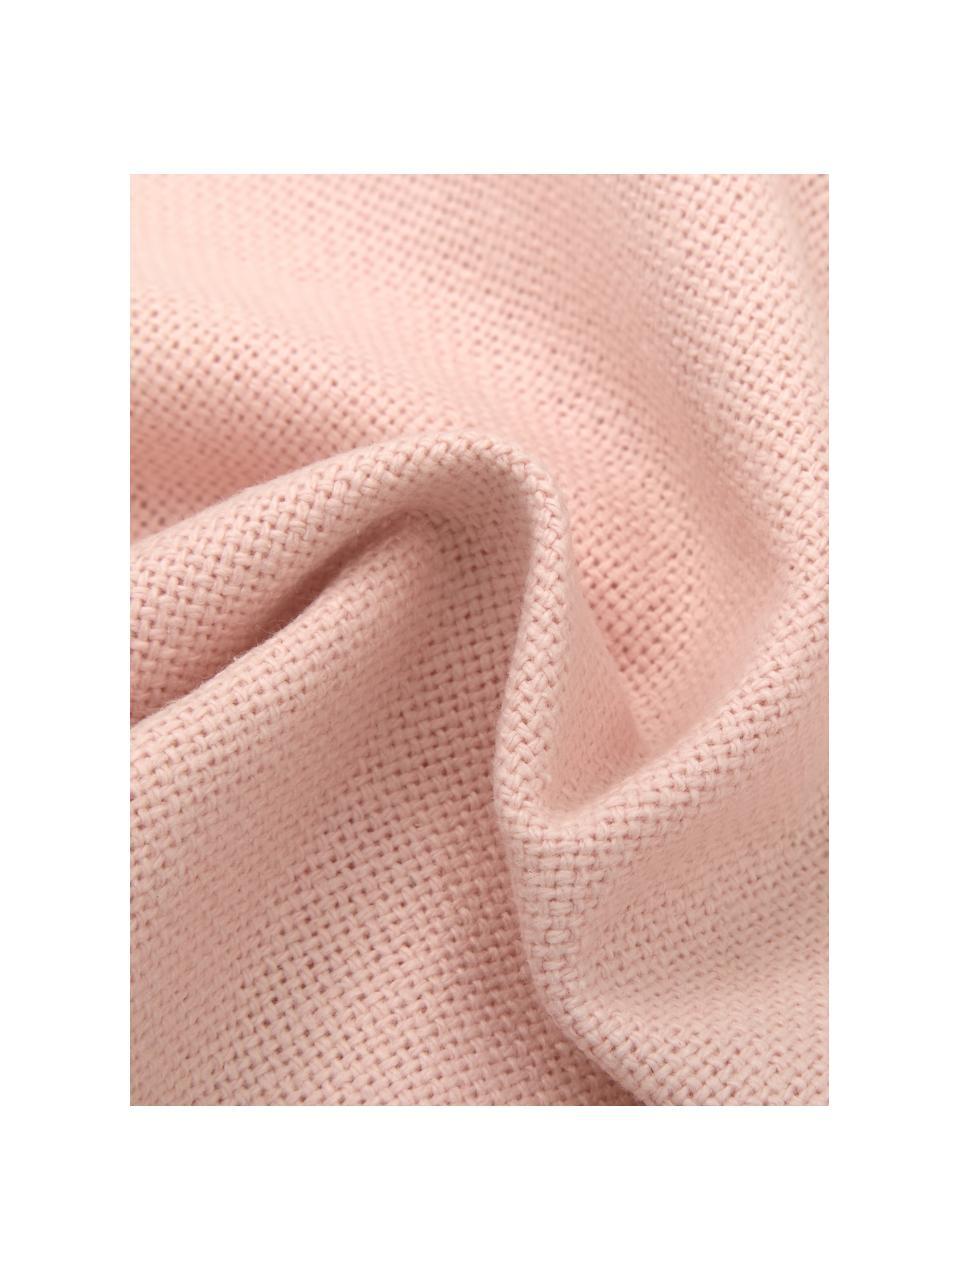 Cojín con flecos Prague, con relleno, Parte delantera: 100%algodón de tejido gr, Parte trasera: 100%algodón, Rosa, An 40 x L 40 cm